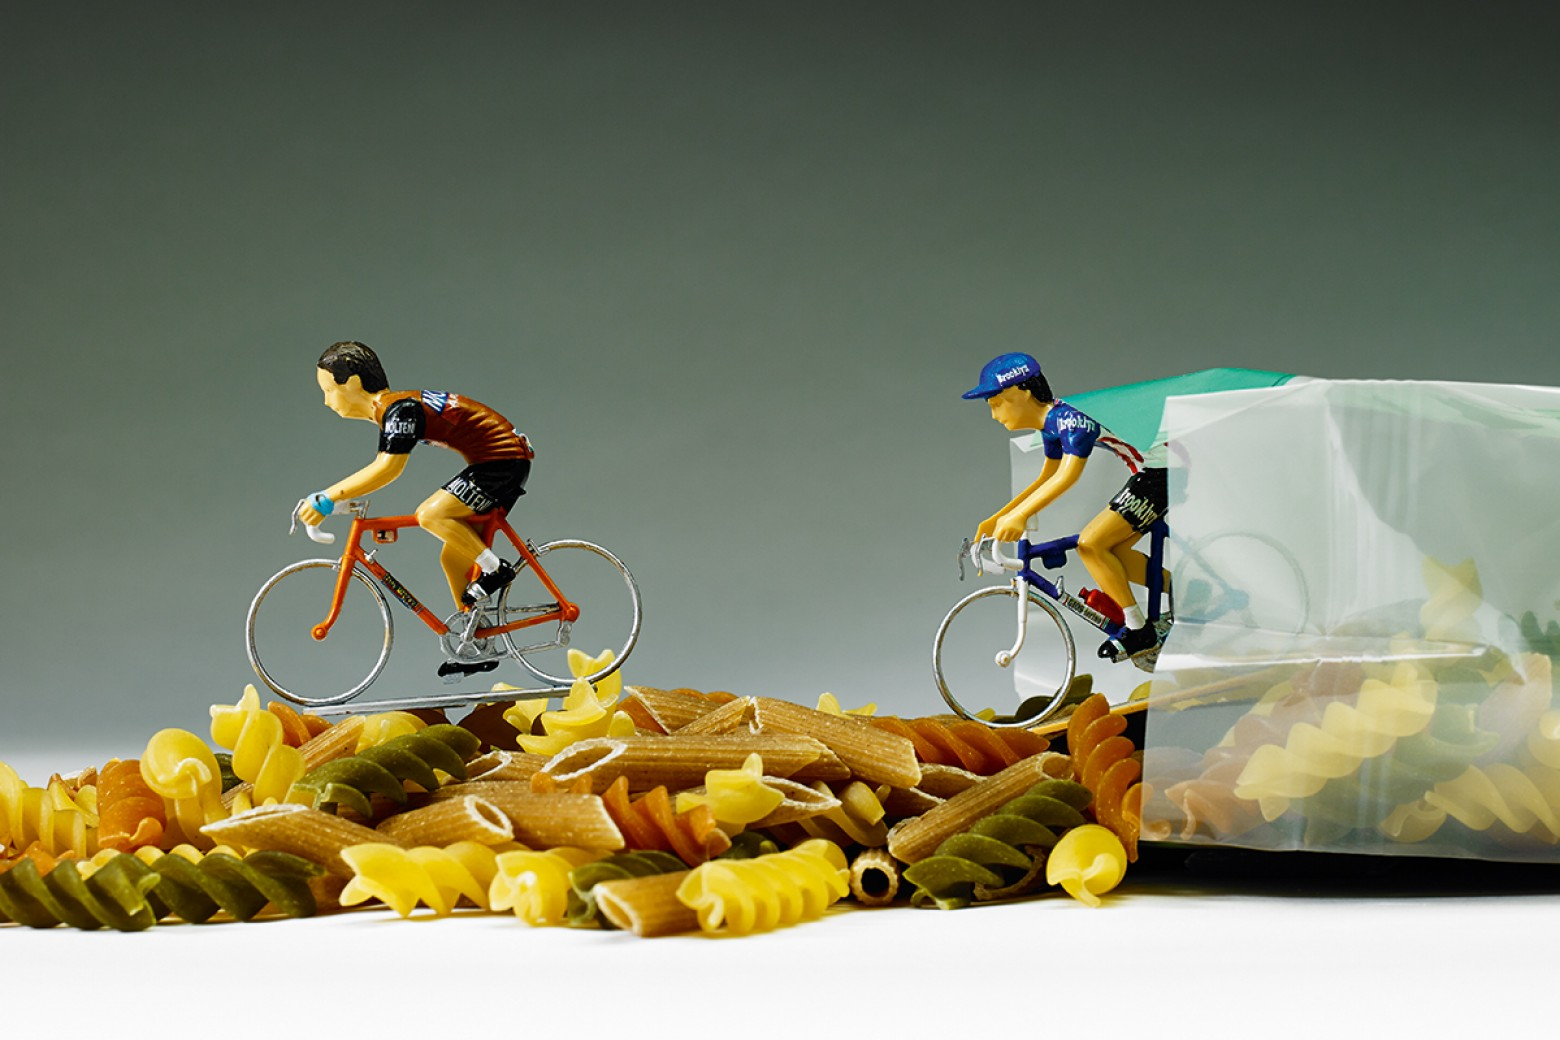 no-comer-pasta-ciclismo/